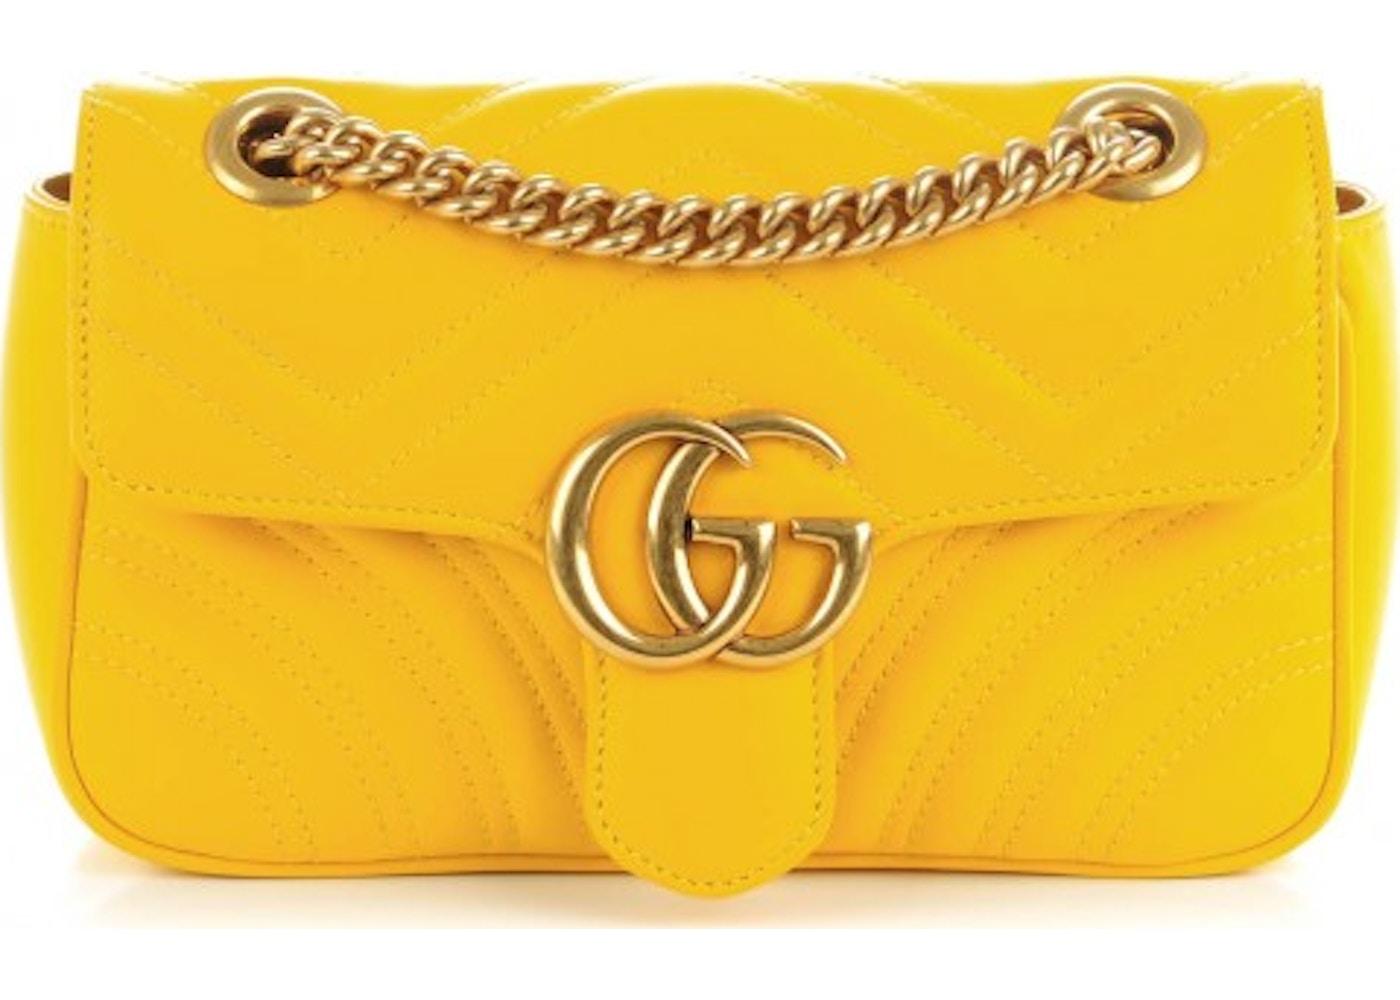 7576d83057fa Gucci Marmont Shoulder Matelasse Mini Yellow. Matelasse Mini Yellow